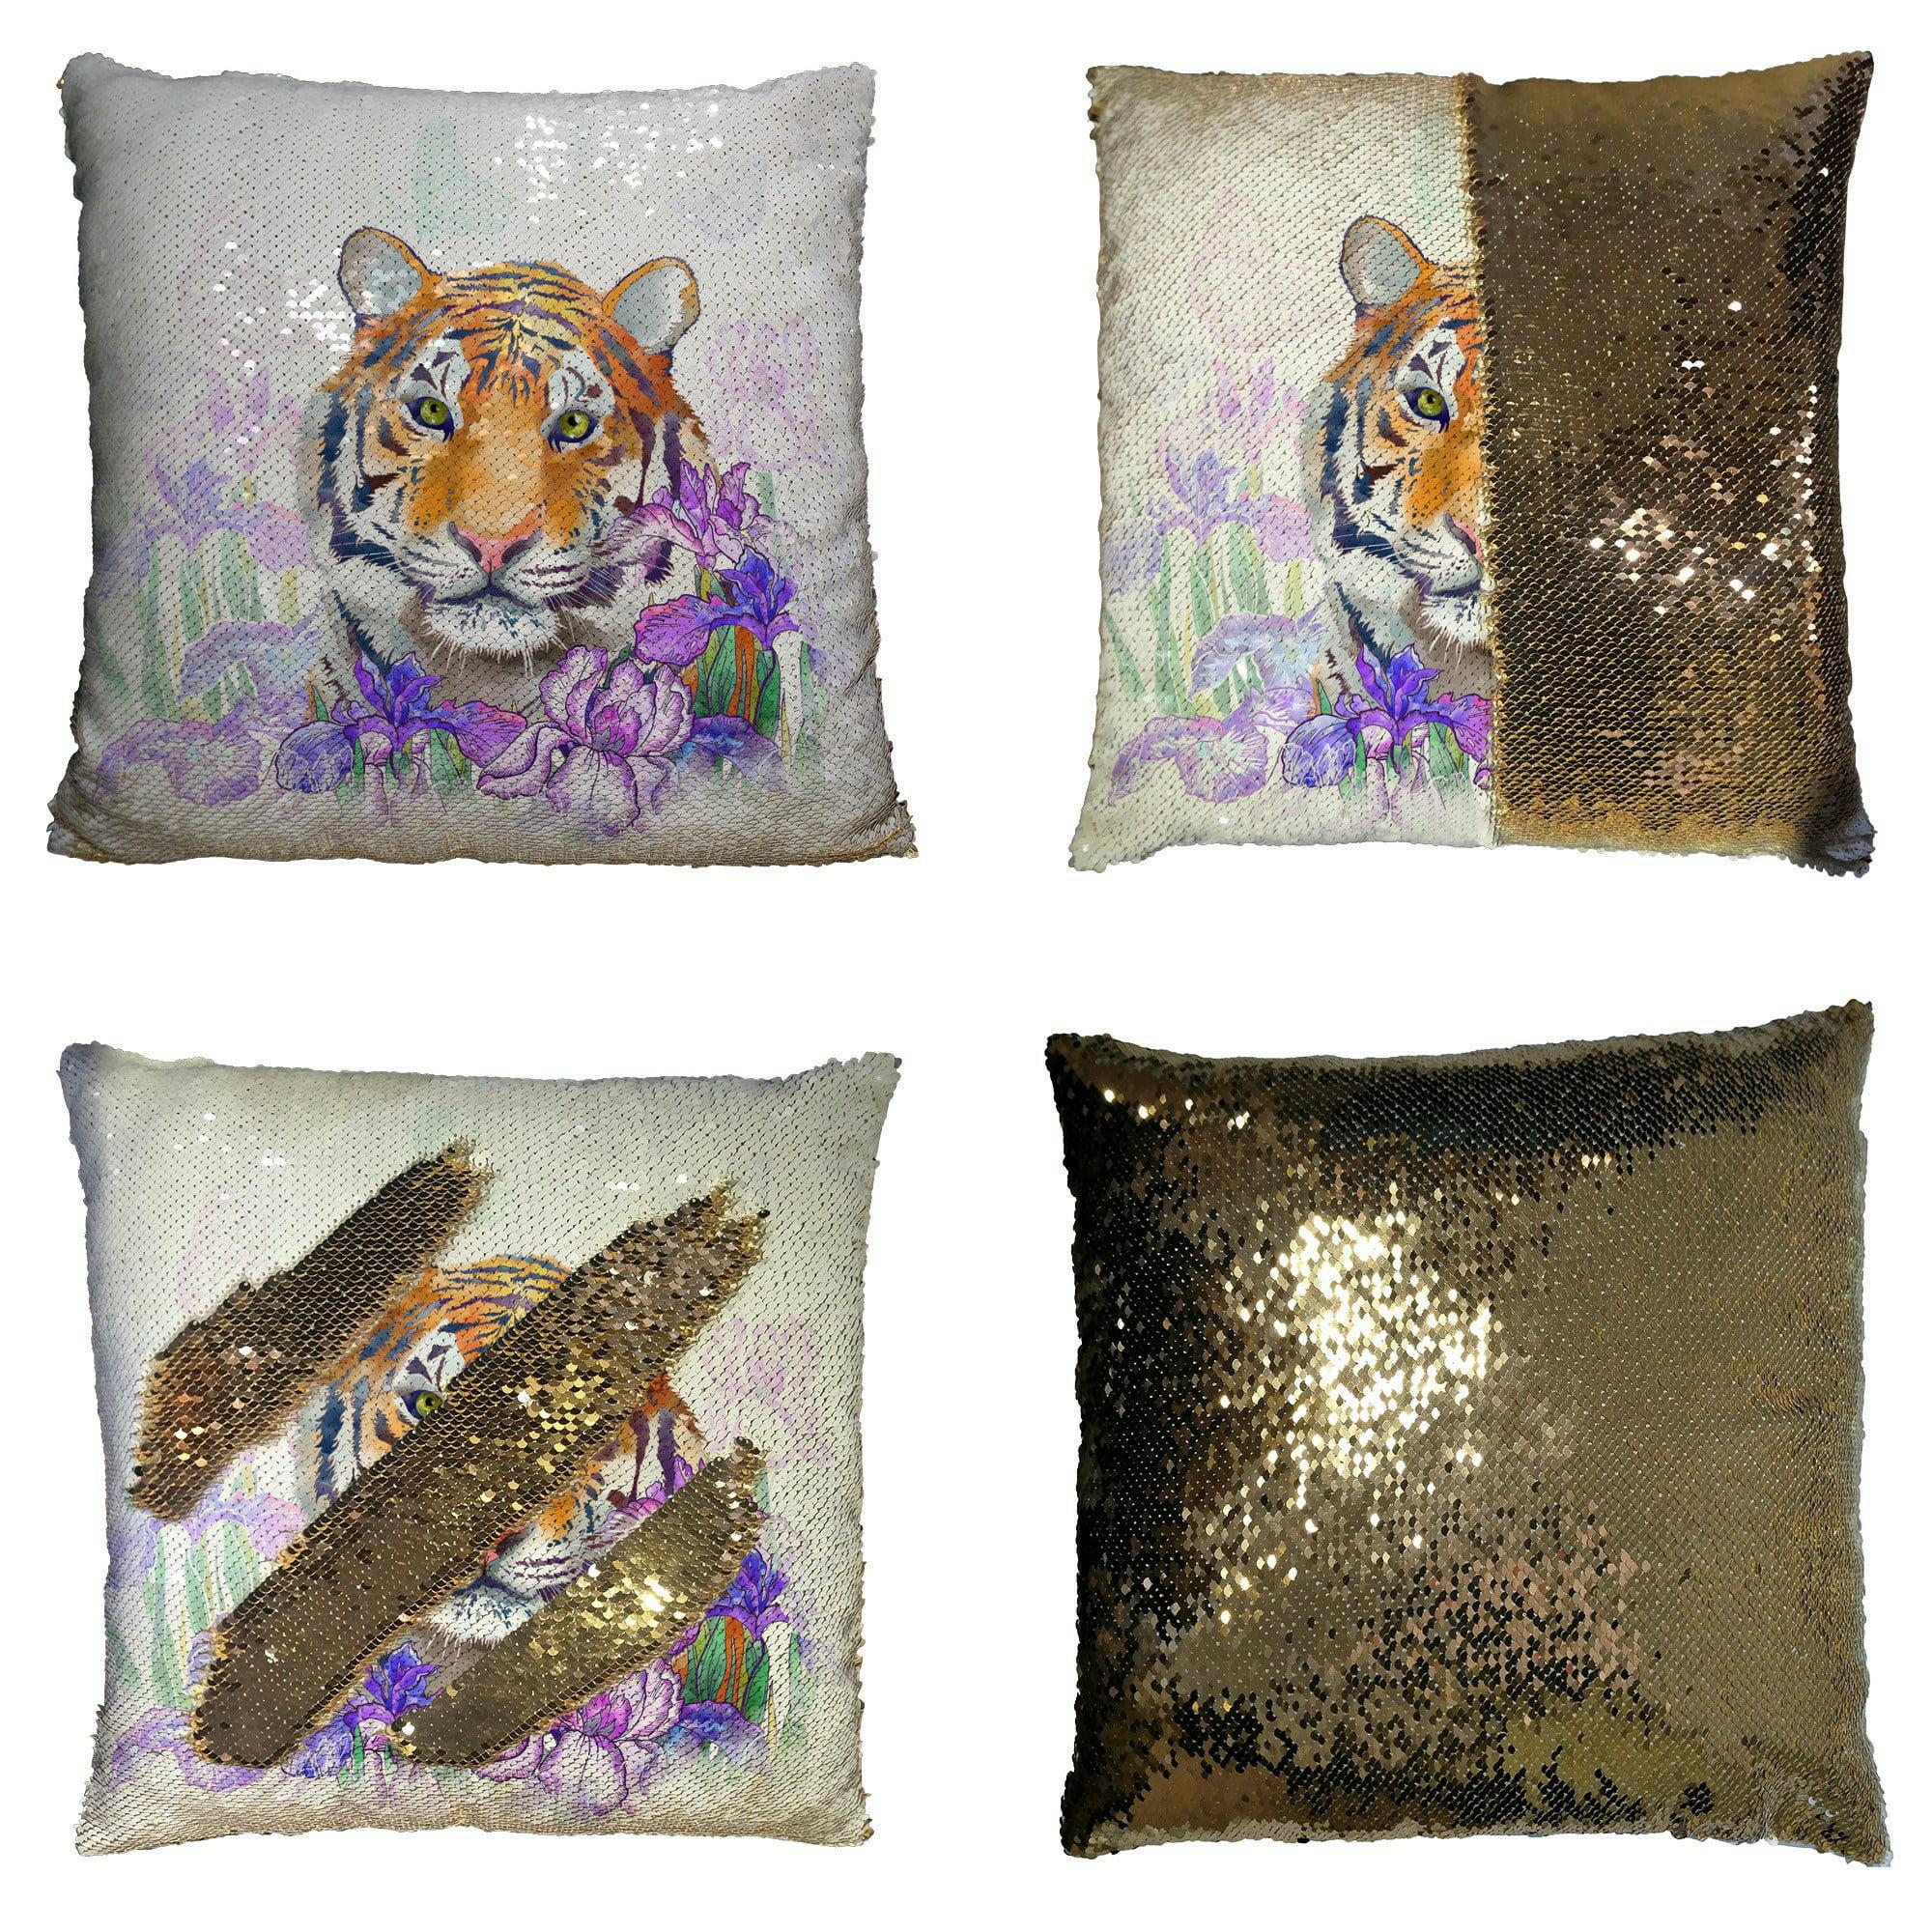 Abphqto Tiger And Flowers Iris Reversible Mermaid Sequin Pillow Case Home Decor Cushion Cover 18x18 Inch Walmart Com Walmart Com